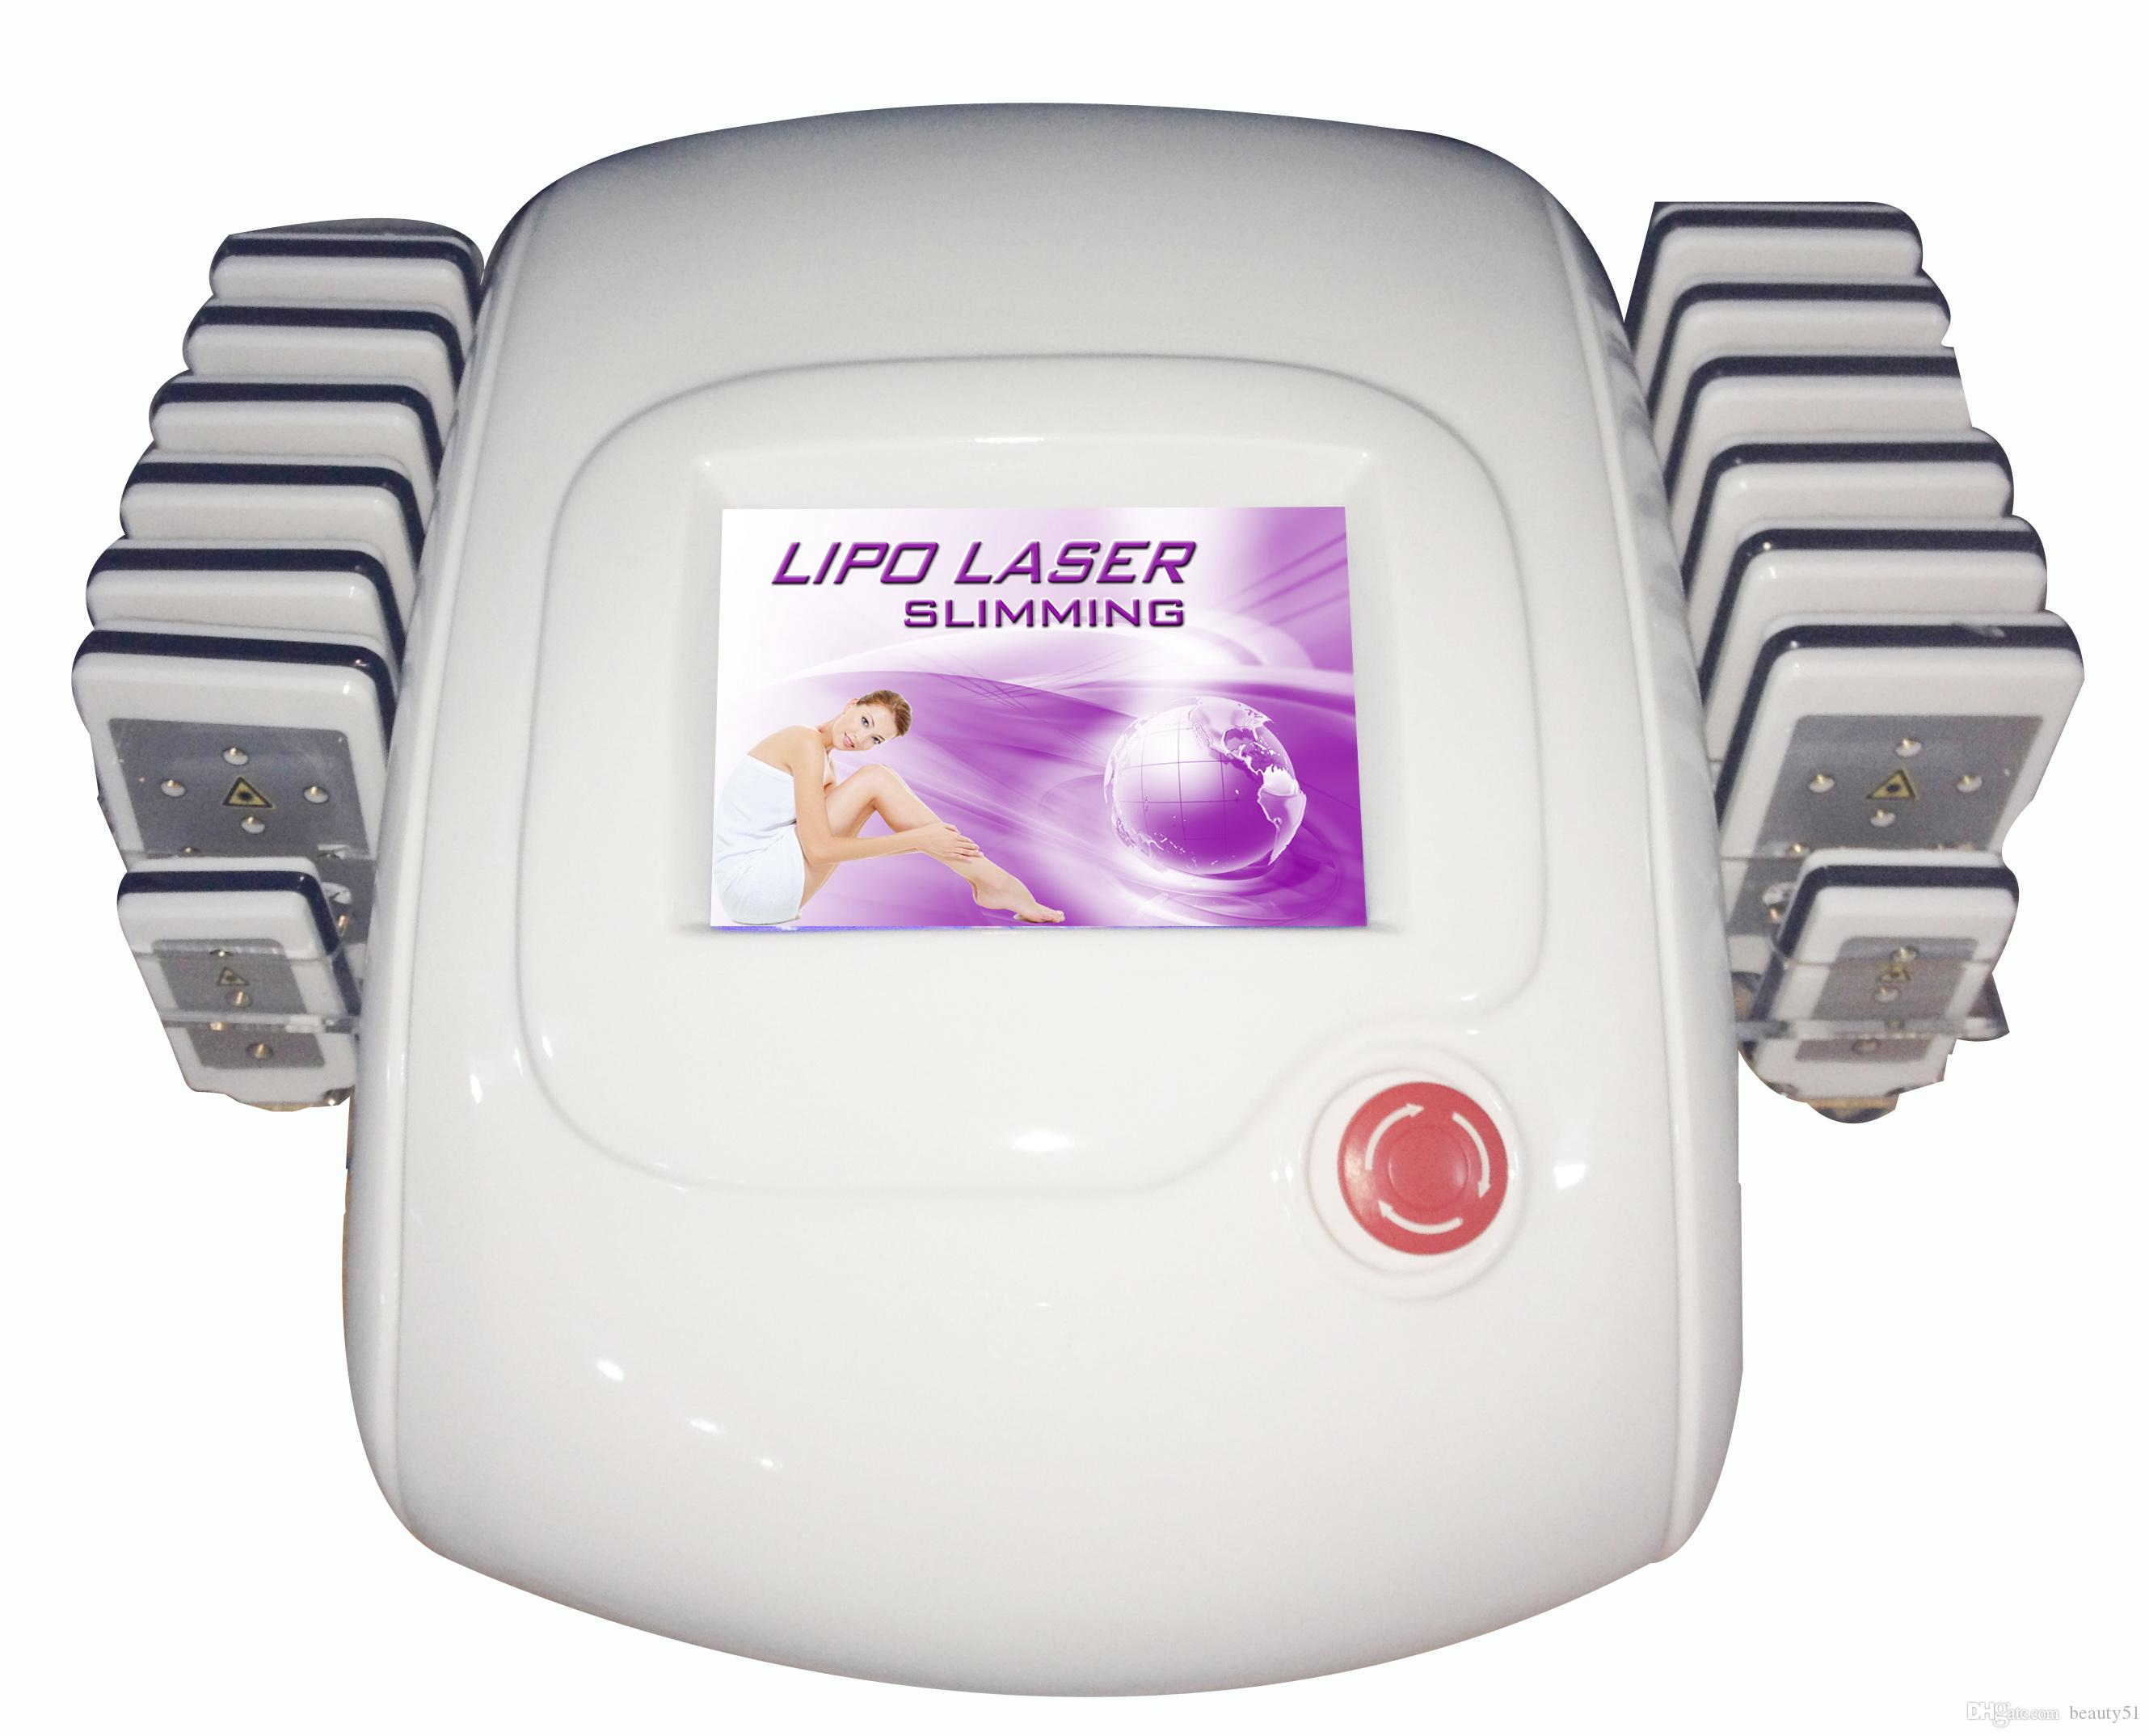 slimming machine lipo laser for sale lipo laser for sale diode lipo. Black Bedroom Furniture Sets. Home Design Ideas